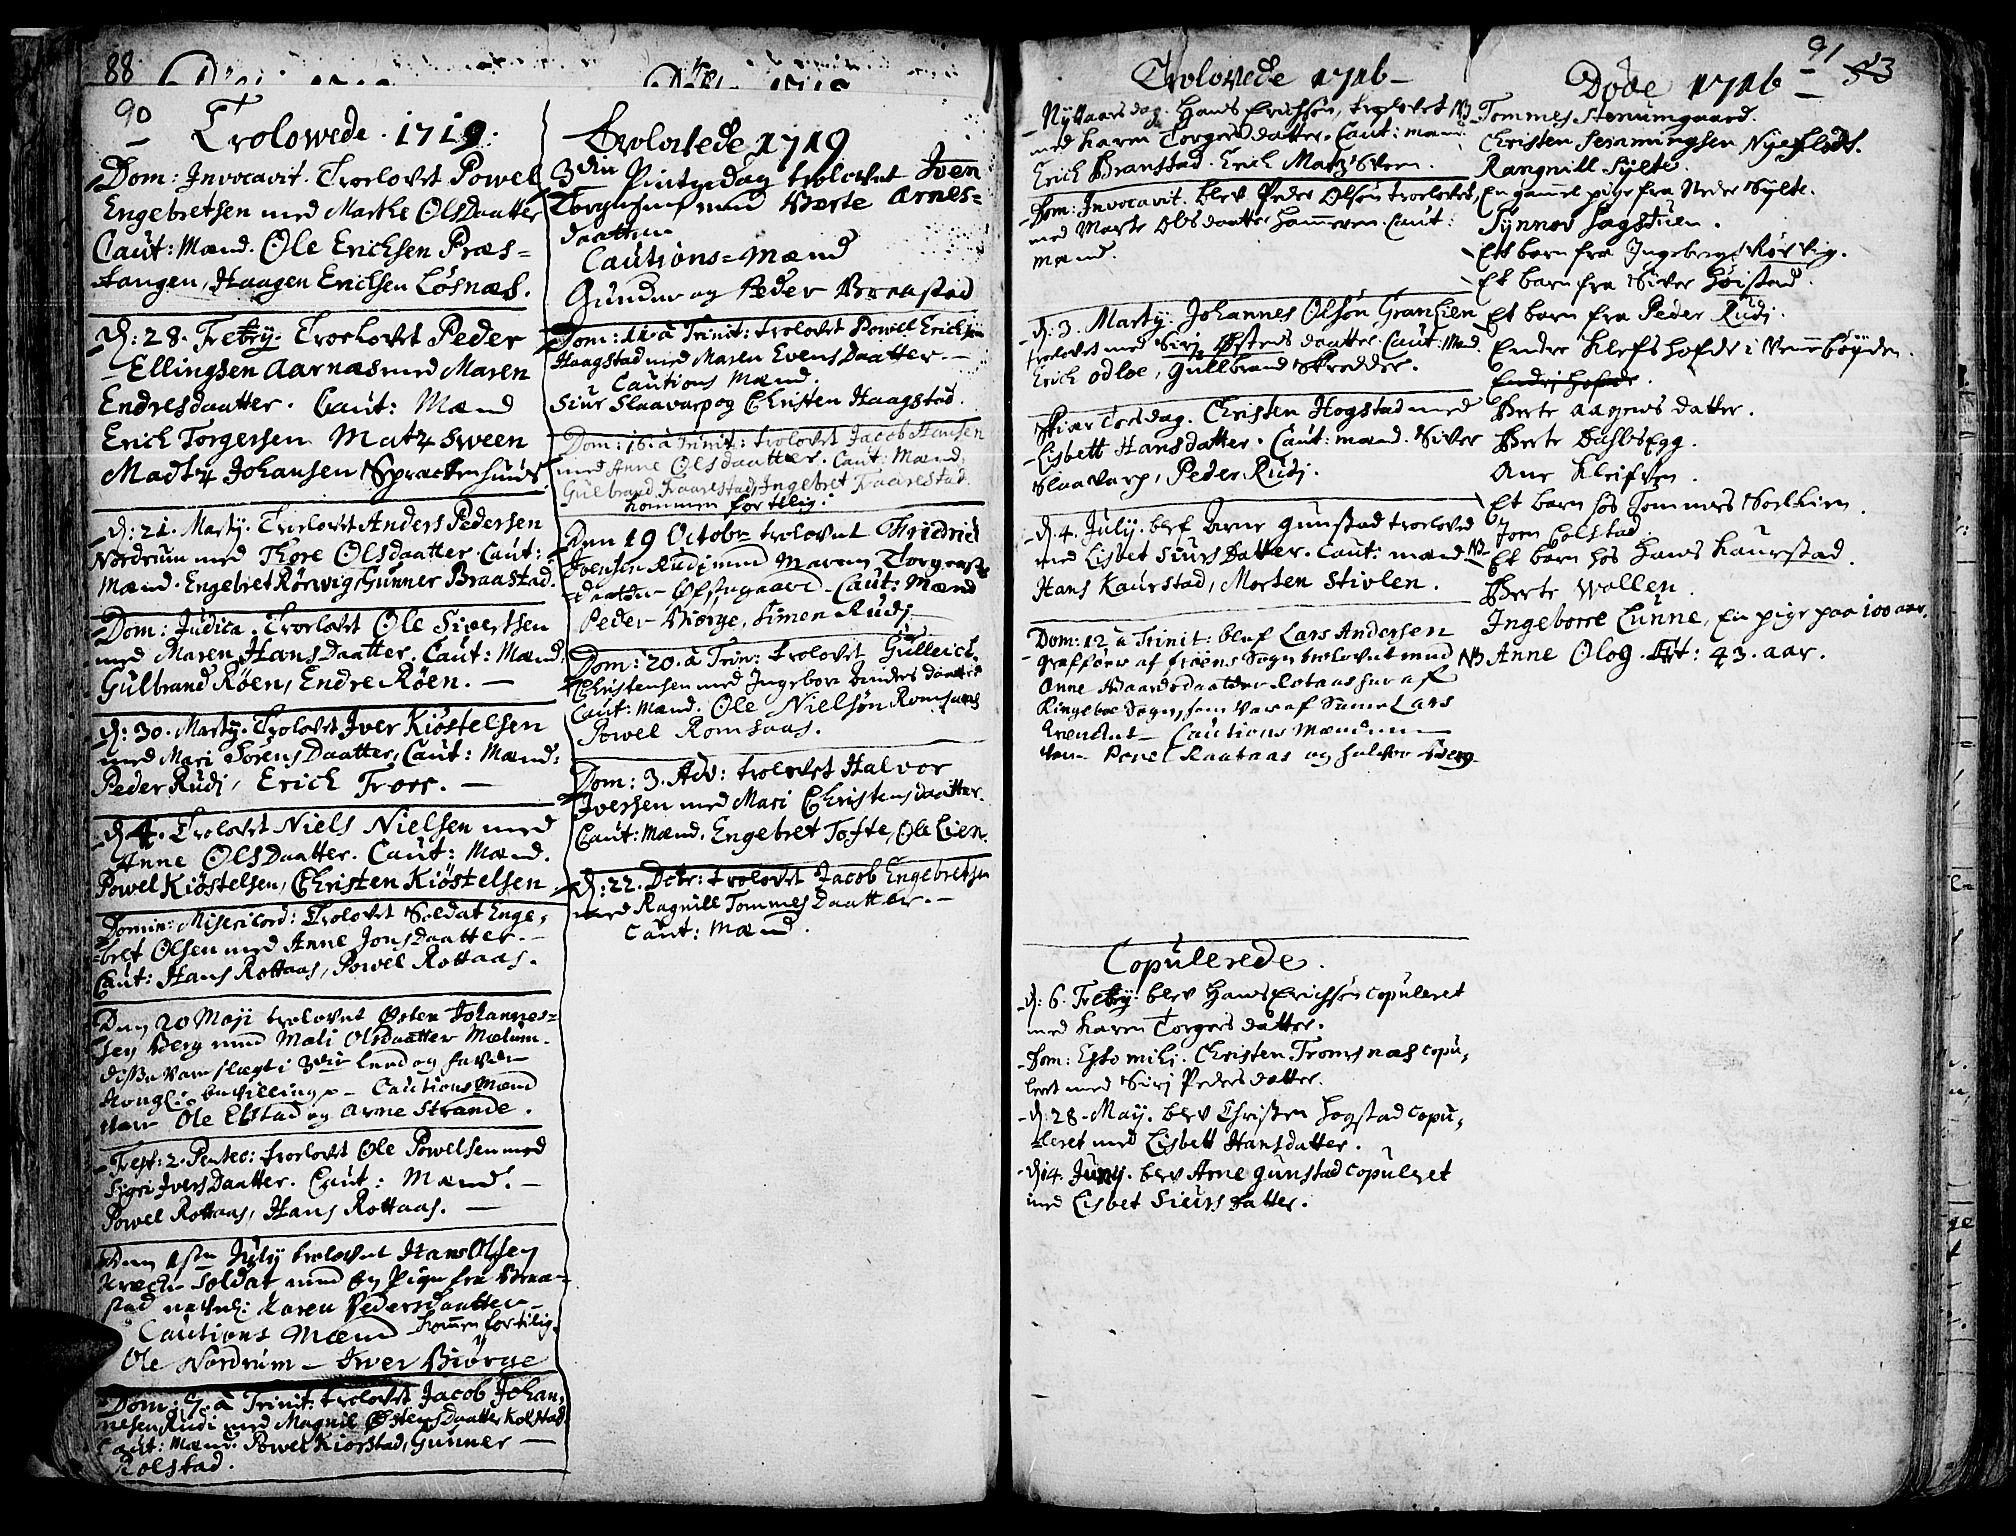 SAH, Ringebu prestekontor, Ministerialbok nr. 1, 1696-1733, s. 90-91